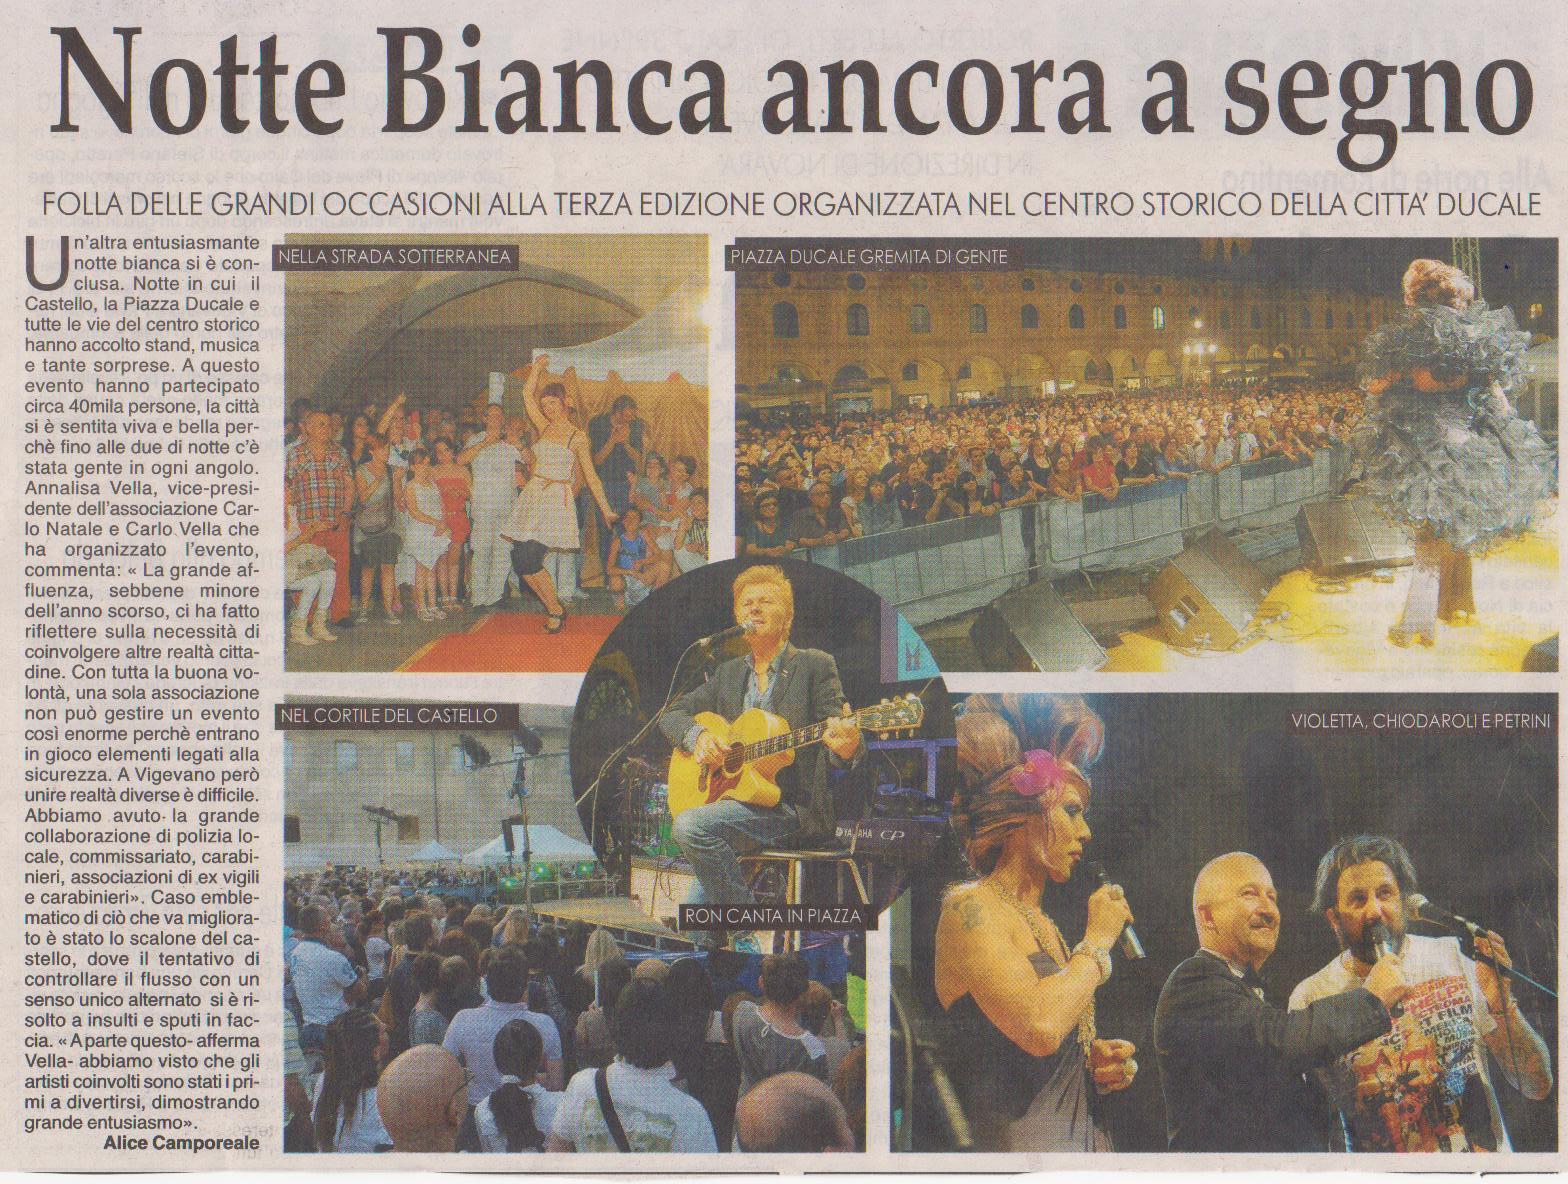 Grande Successo per la Notte Bianca 2013 in PIazza Ducale a Vigevano